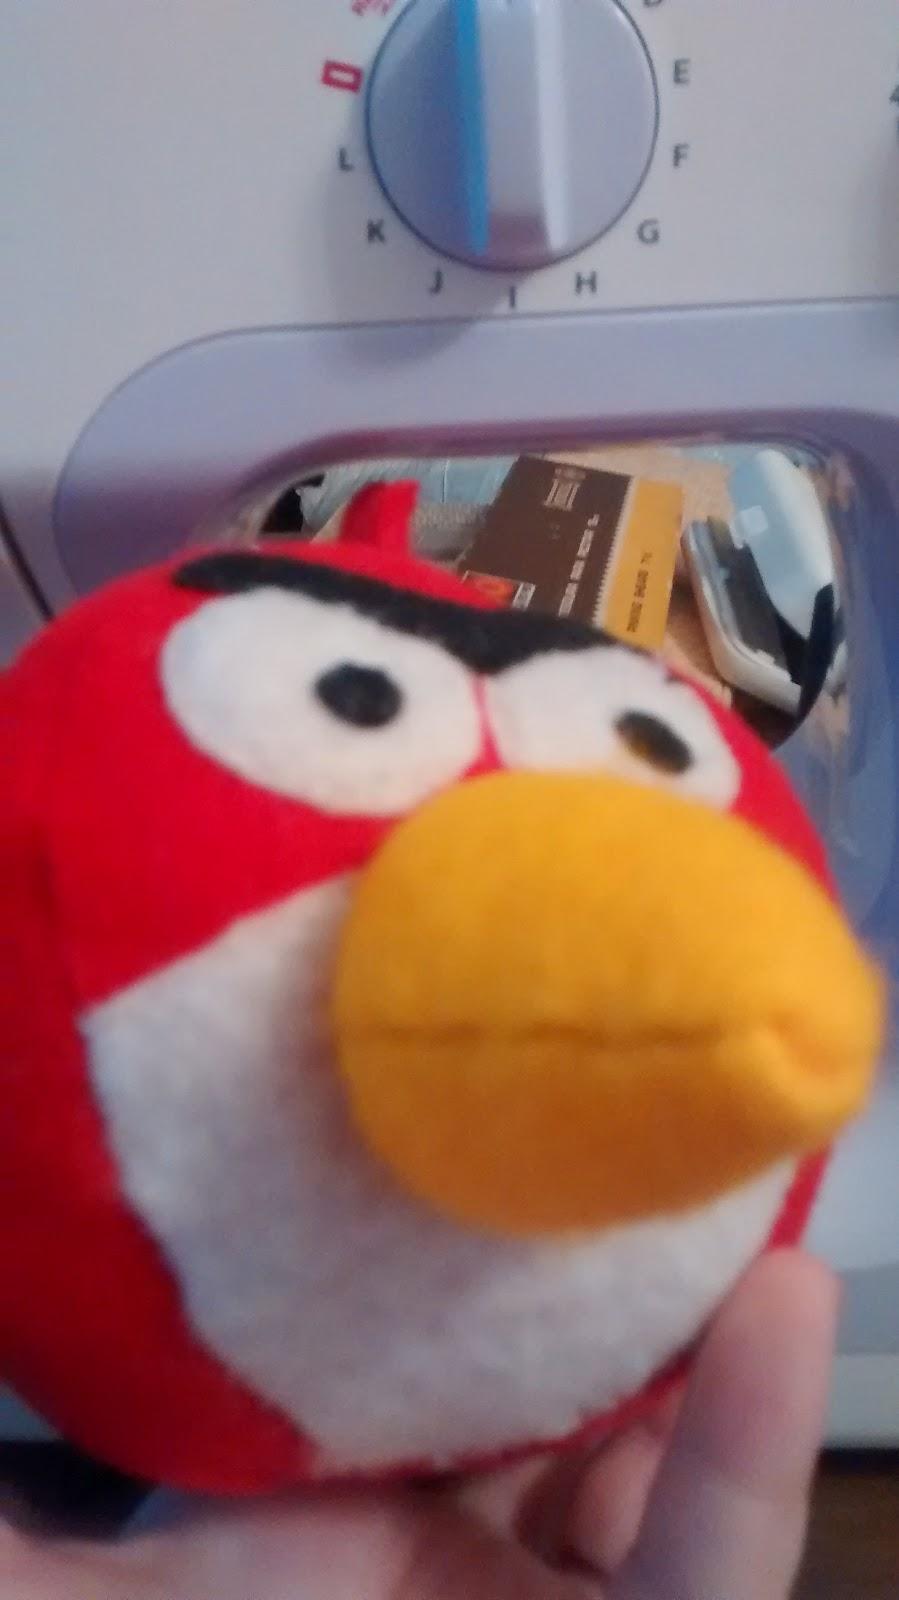 patron gratis angry birds